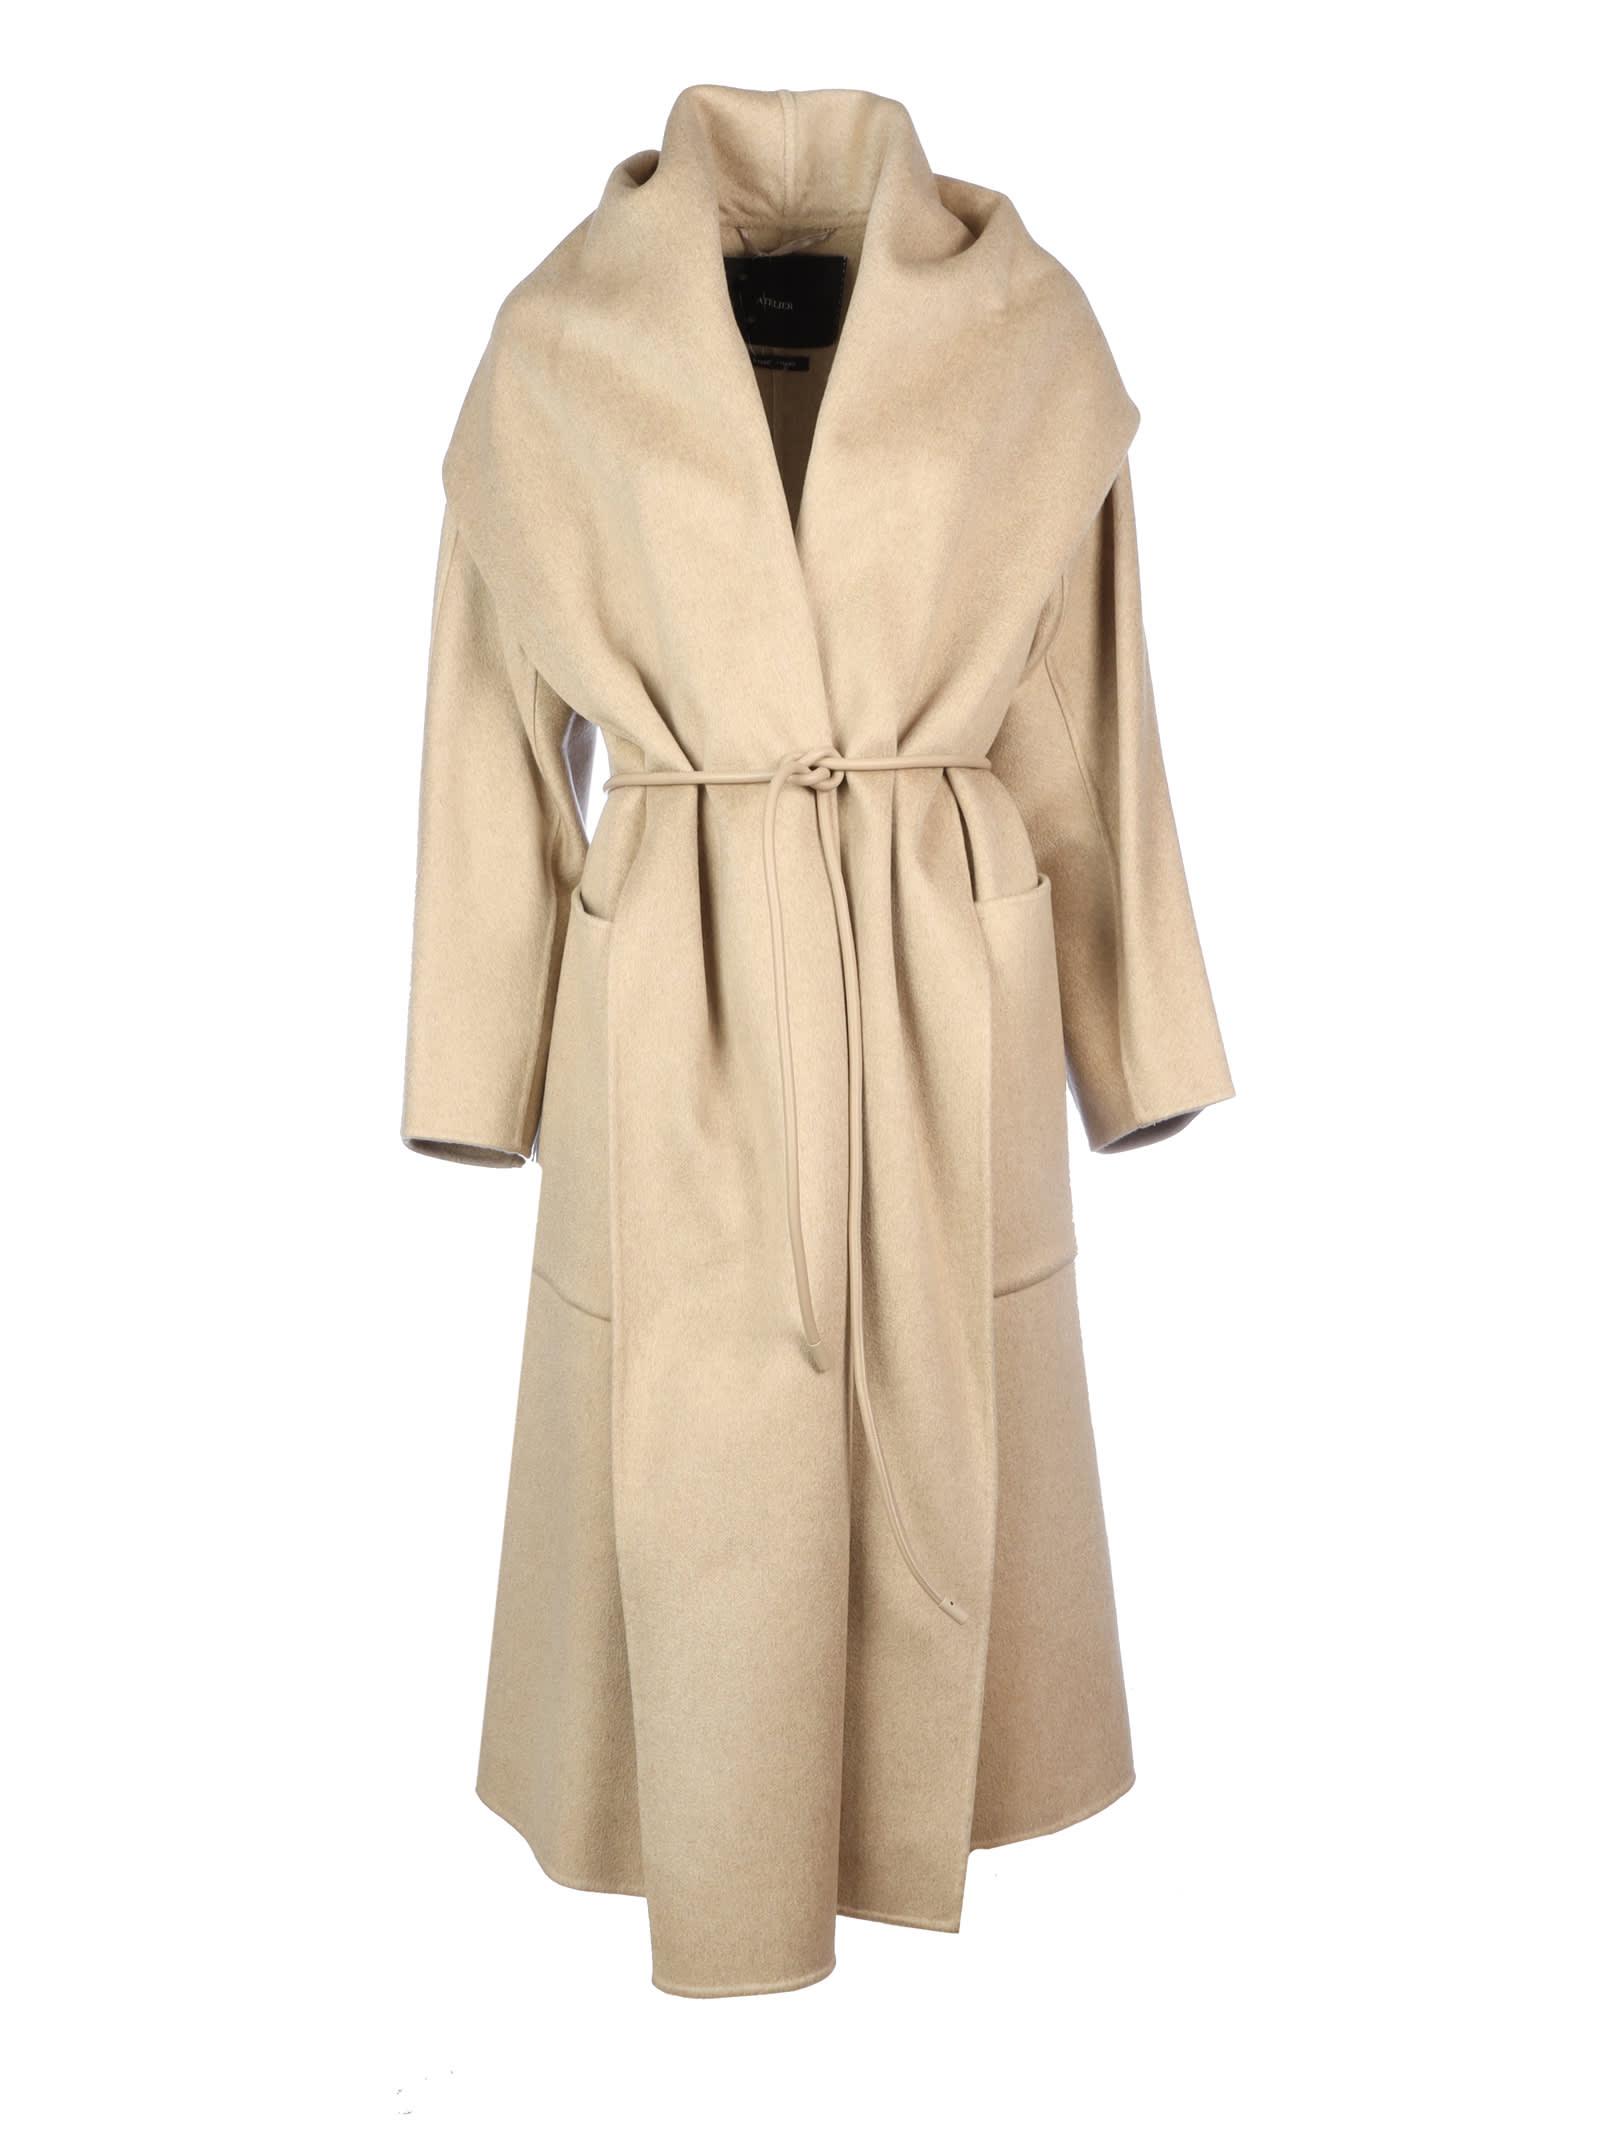 Photo of  Max Mara Disegno Line Atelier Over /collo Scialle- shop Max Mara jackets online sales